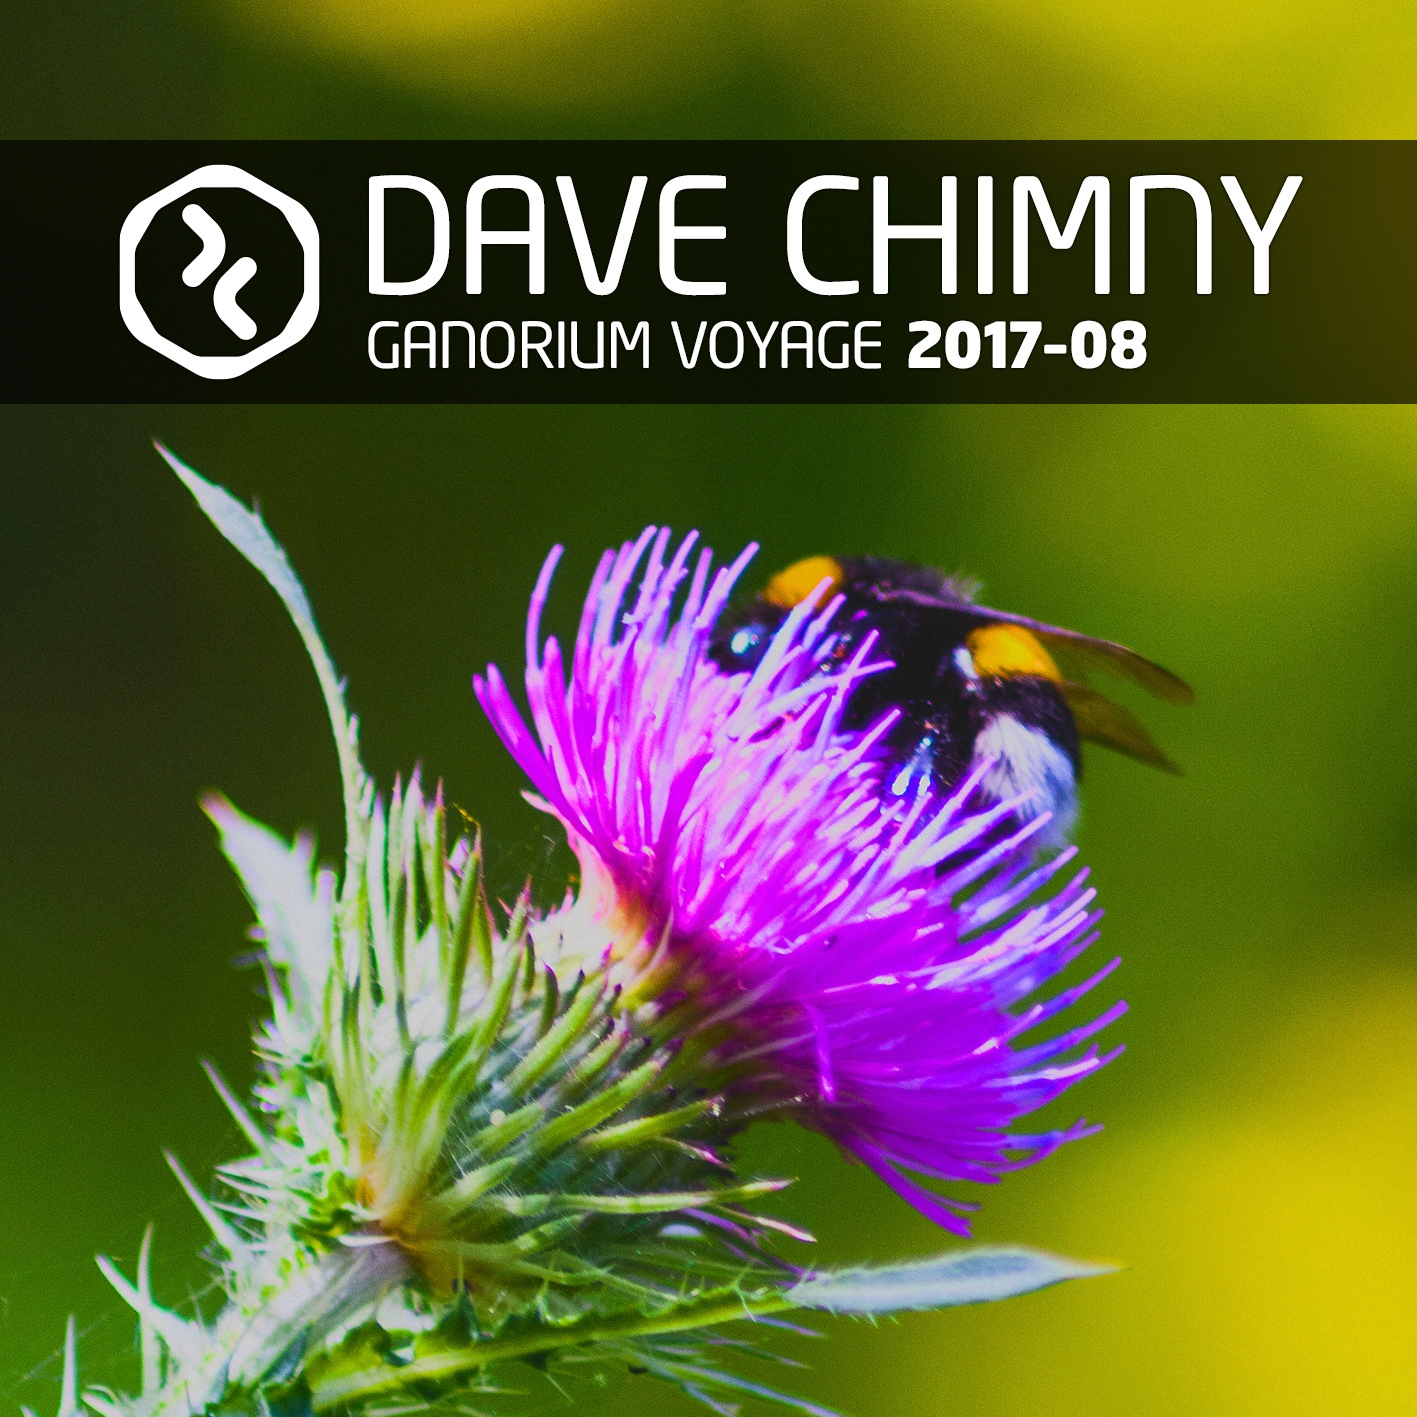 Dave Chimny – Ganorium Voyage 2017-08